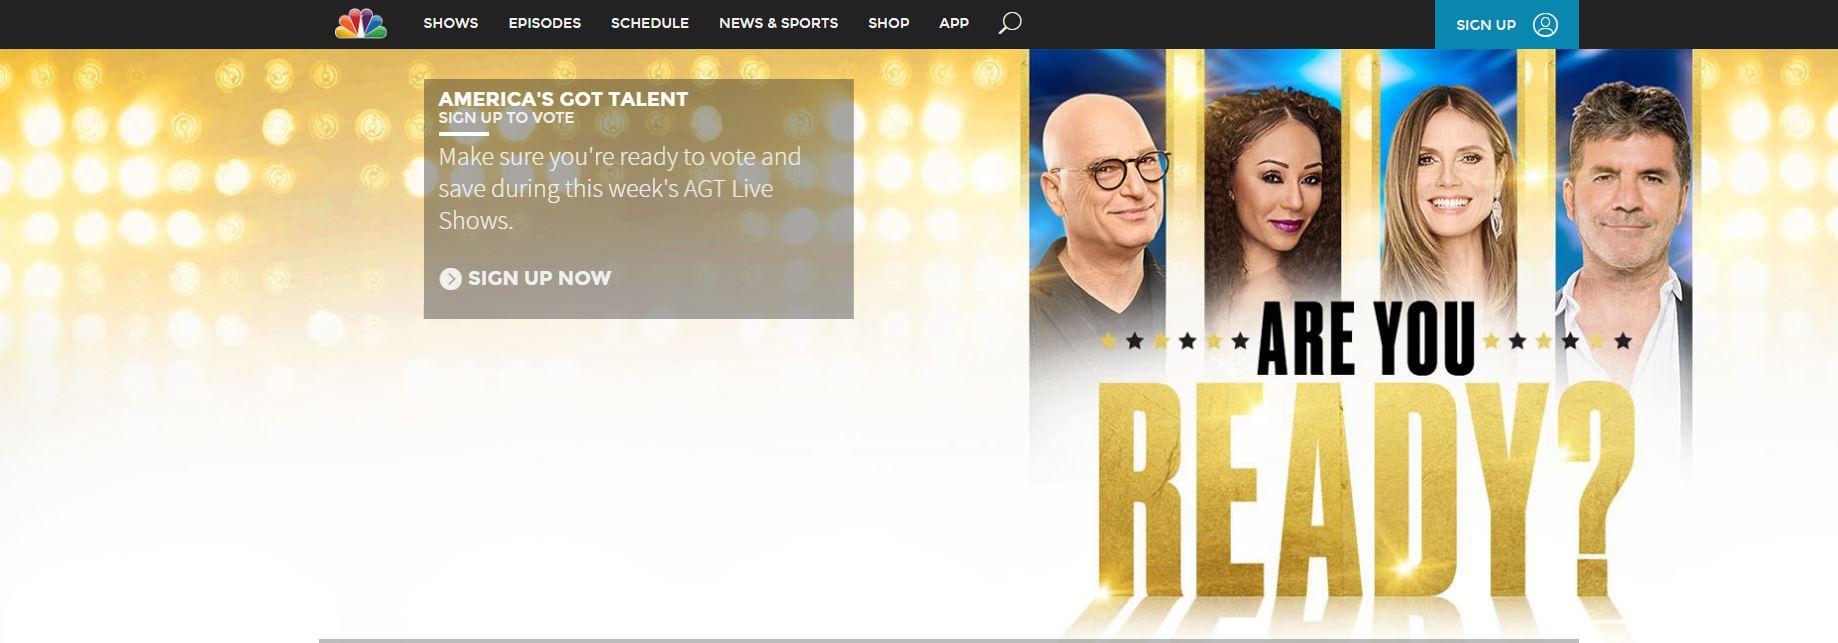 Screenshot of NBC website